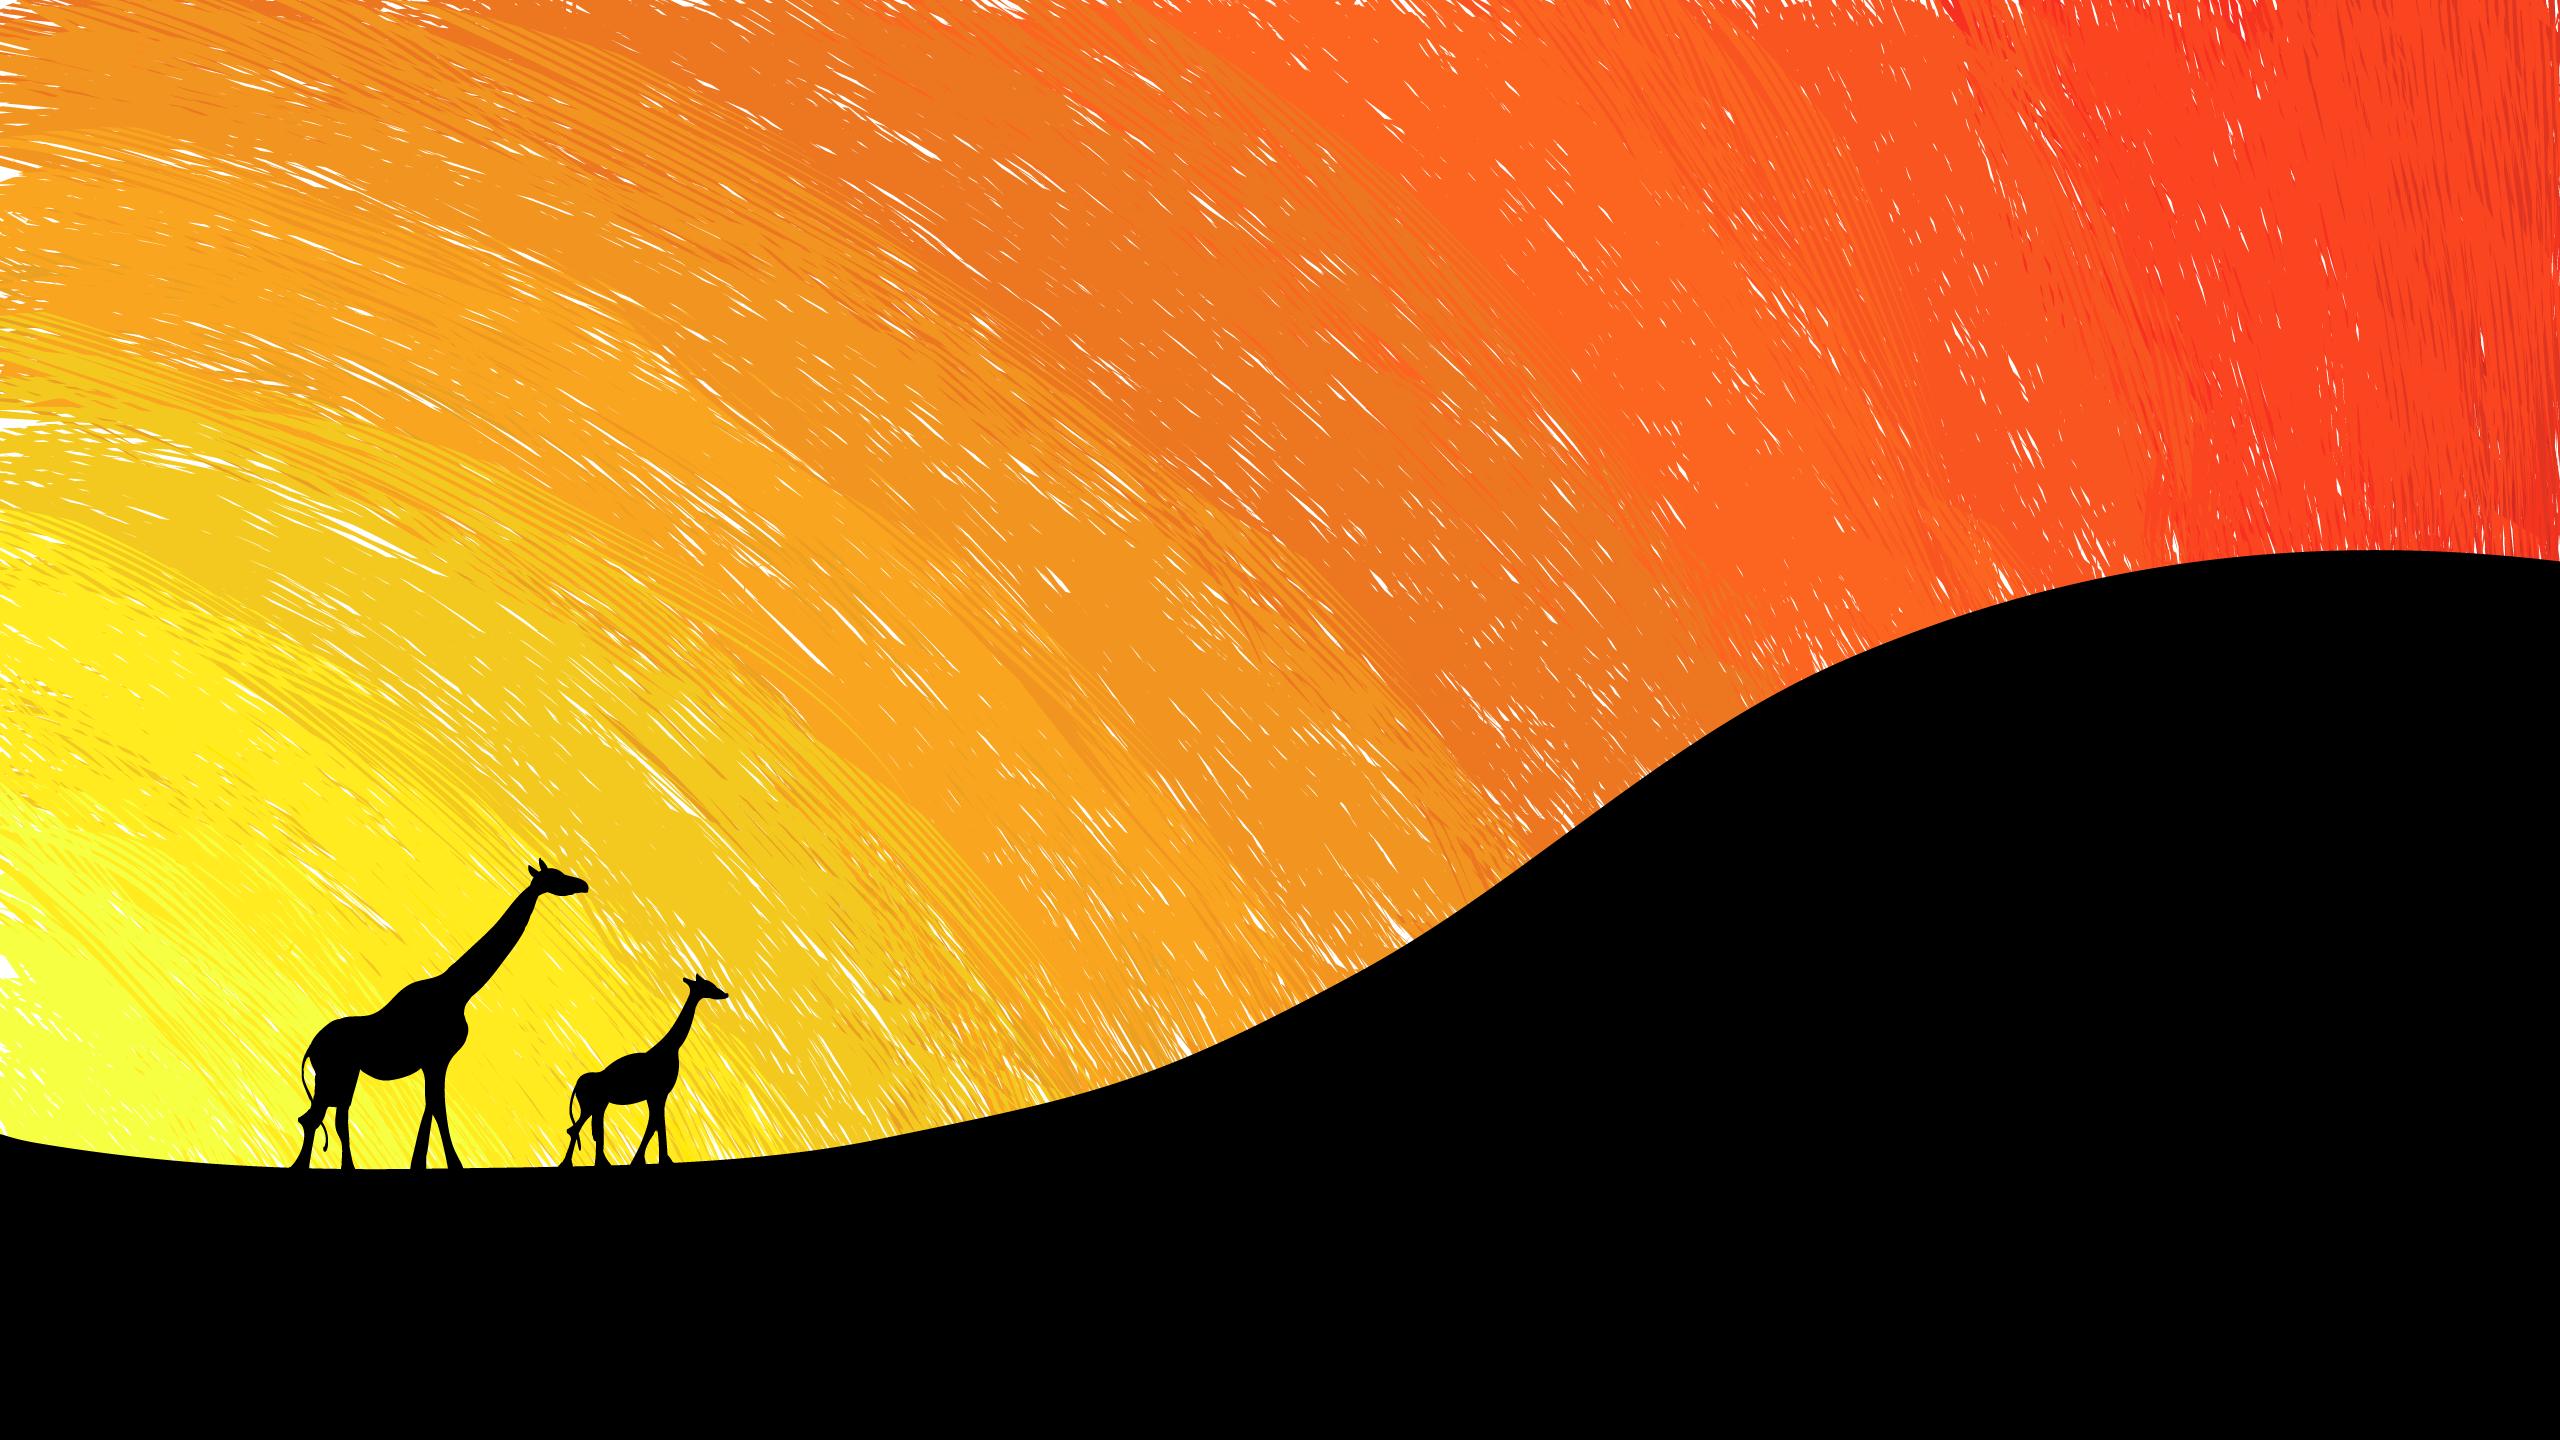 digital art animals sunset minimalism silhouette giraffes yellow hills orange baby animals wave line computer wallpaper geological phenomenon 124767